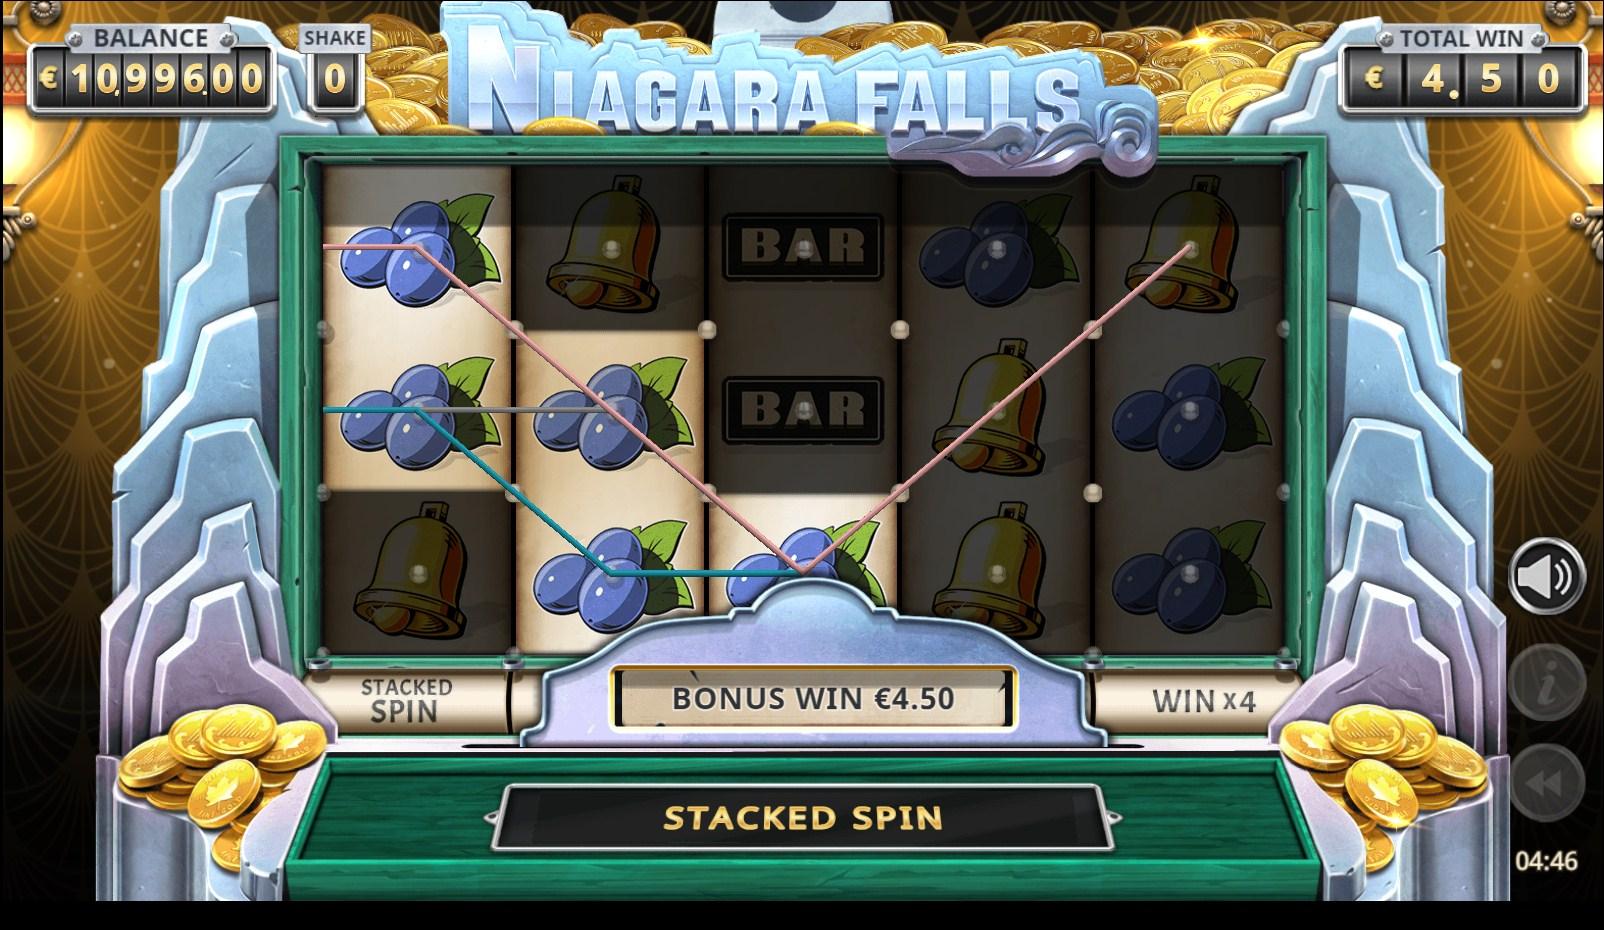 Niagara Falls Slot Gameplay